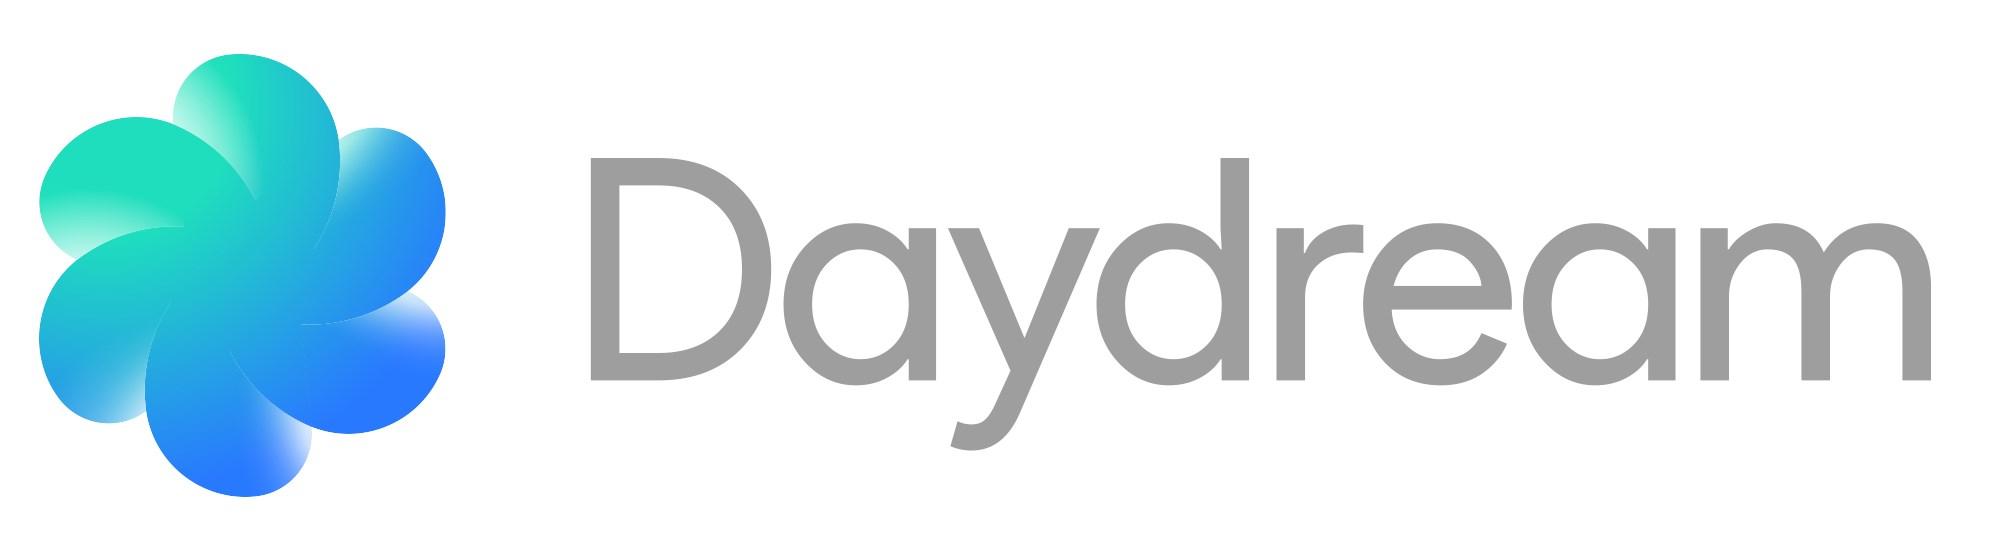 google-daydream-360-vr-headset